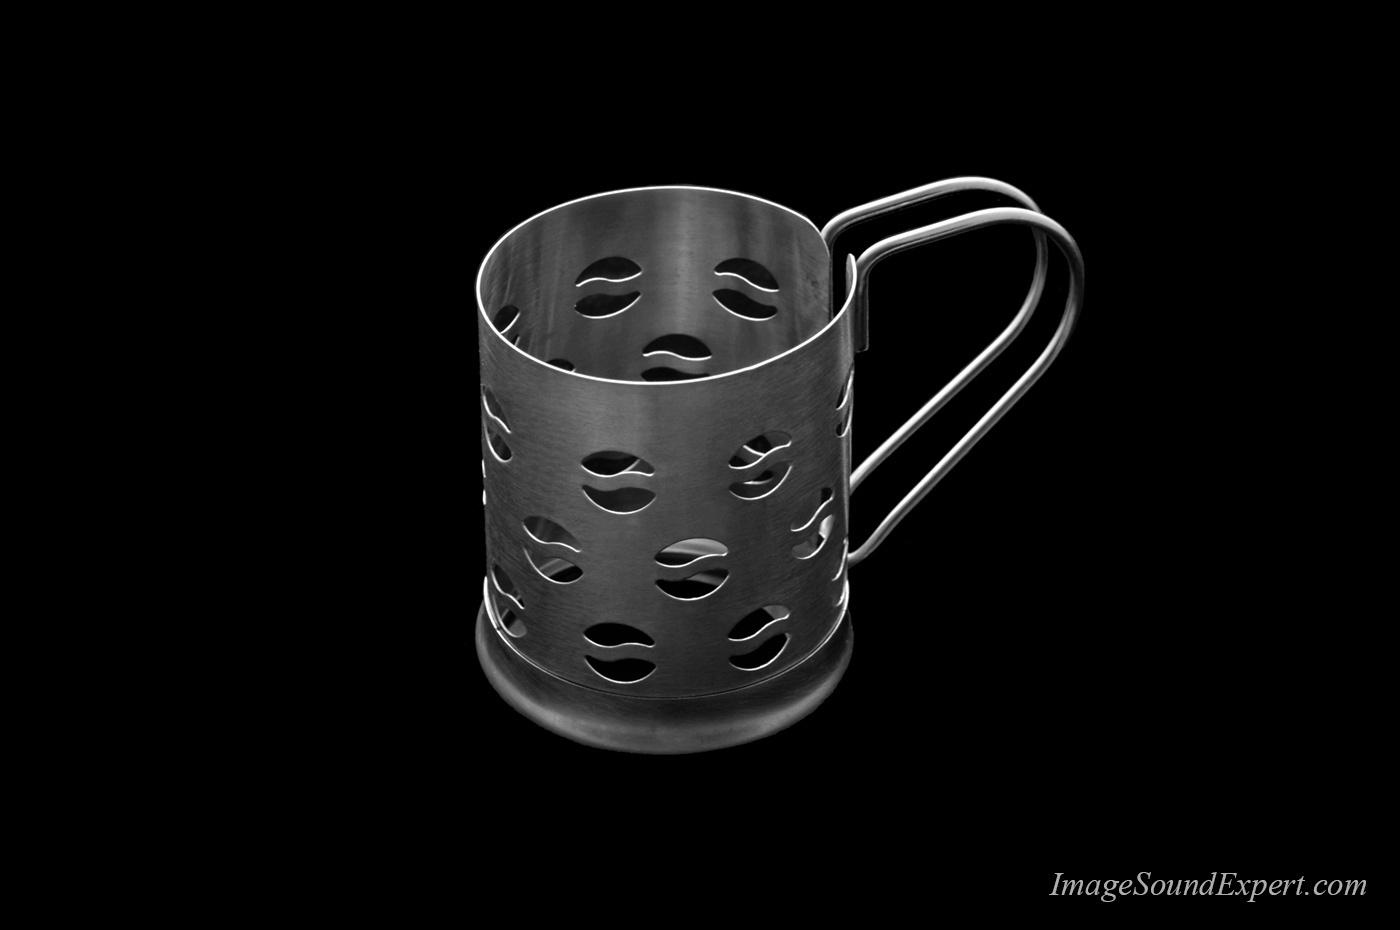 Silber Produktfotografie  by imagesoundexpert